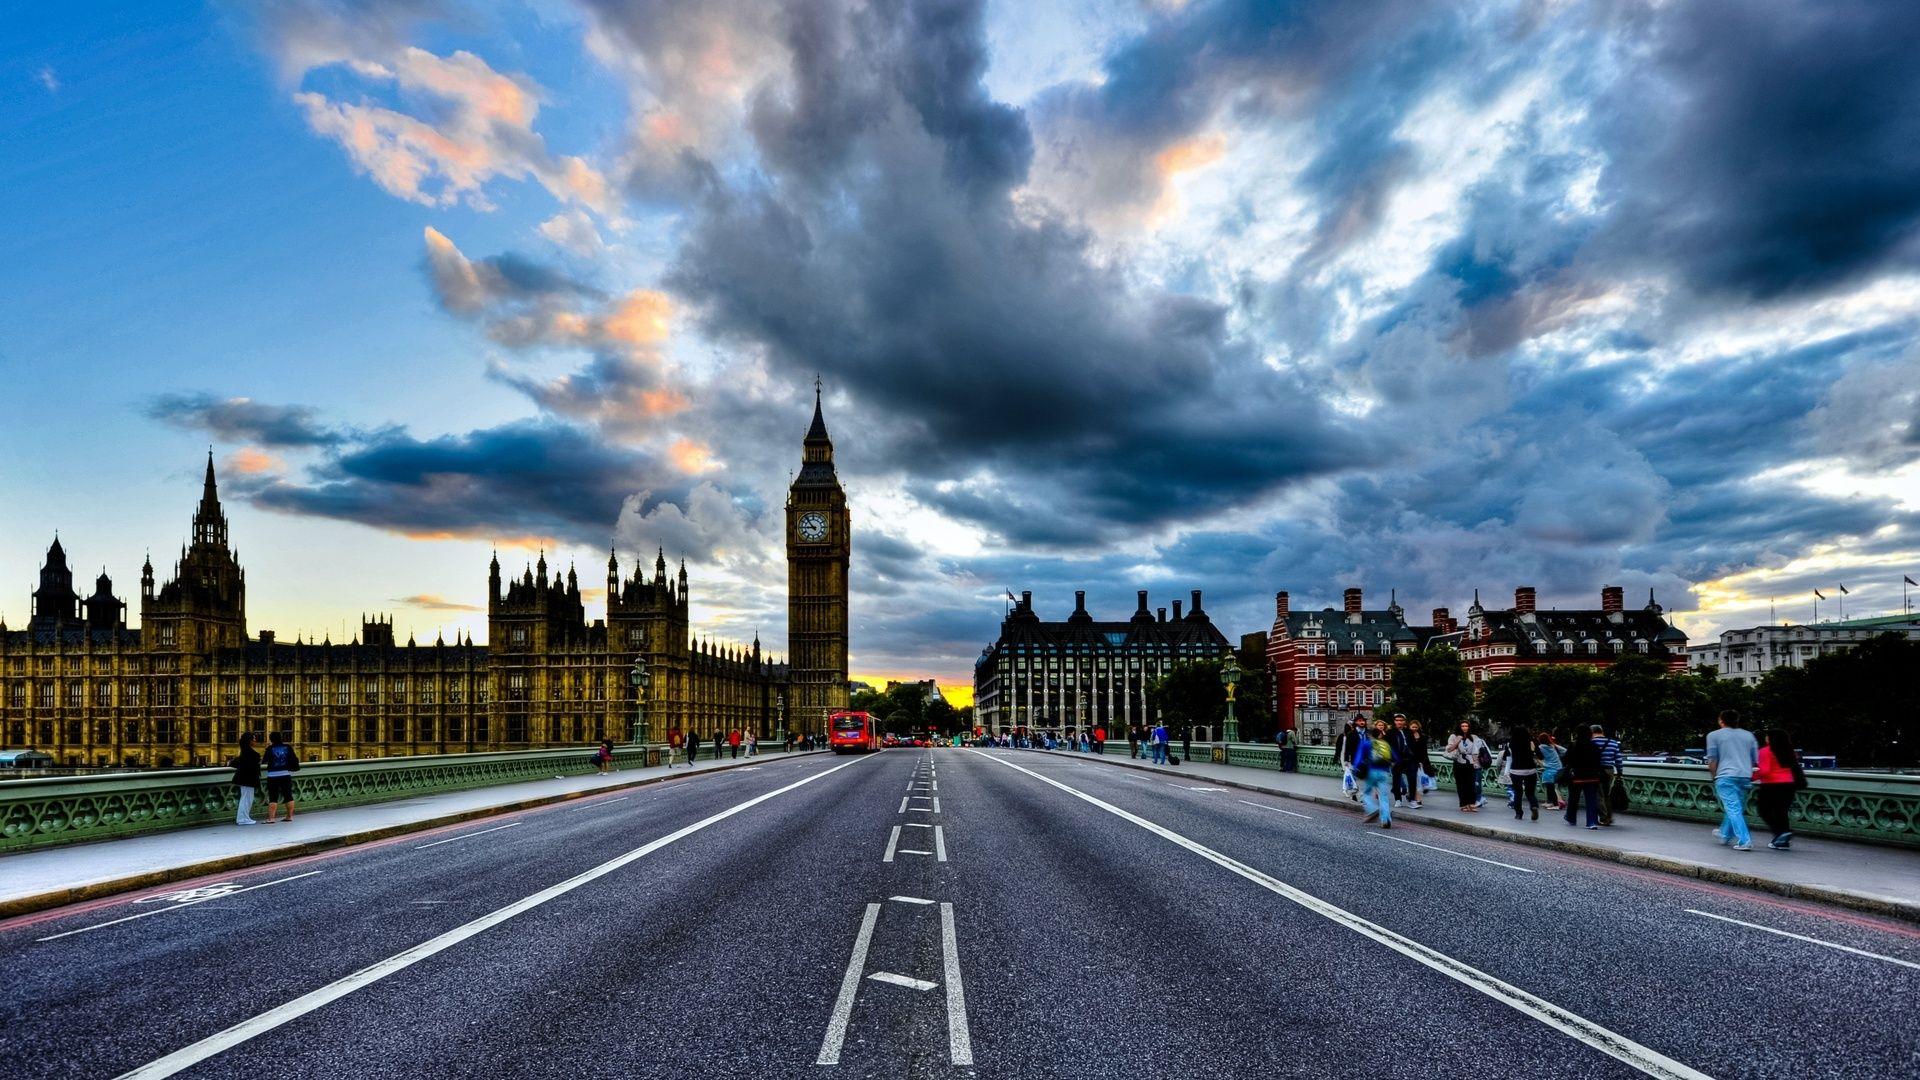 London, англия, Big Ben, England, Uk, Westminster Palace, Clouds